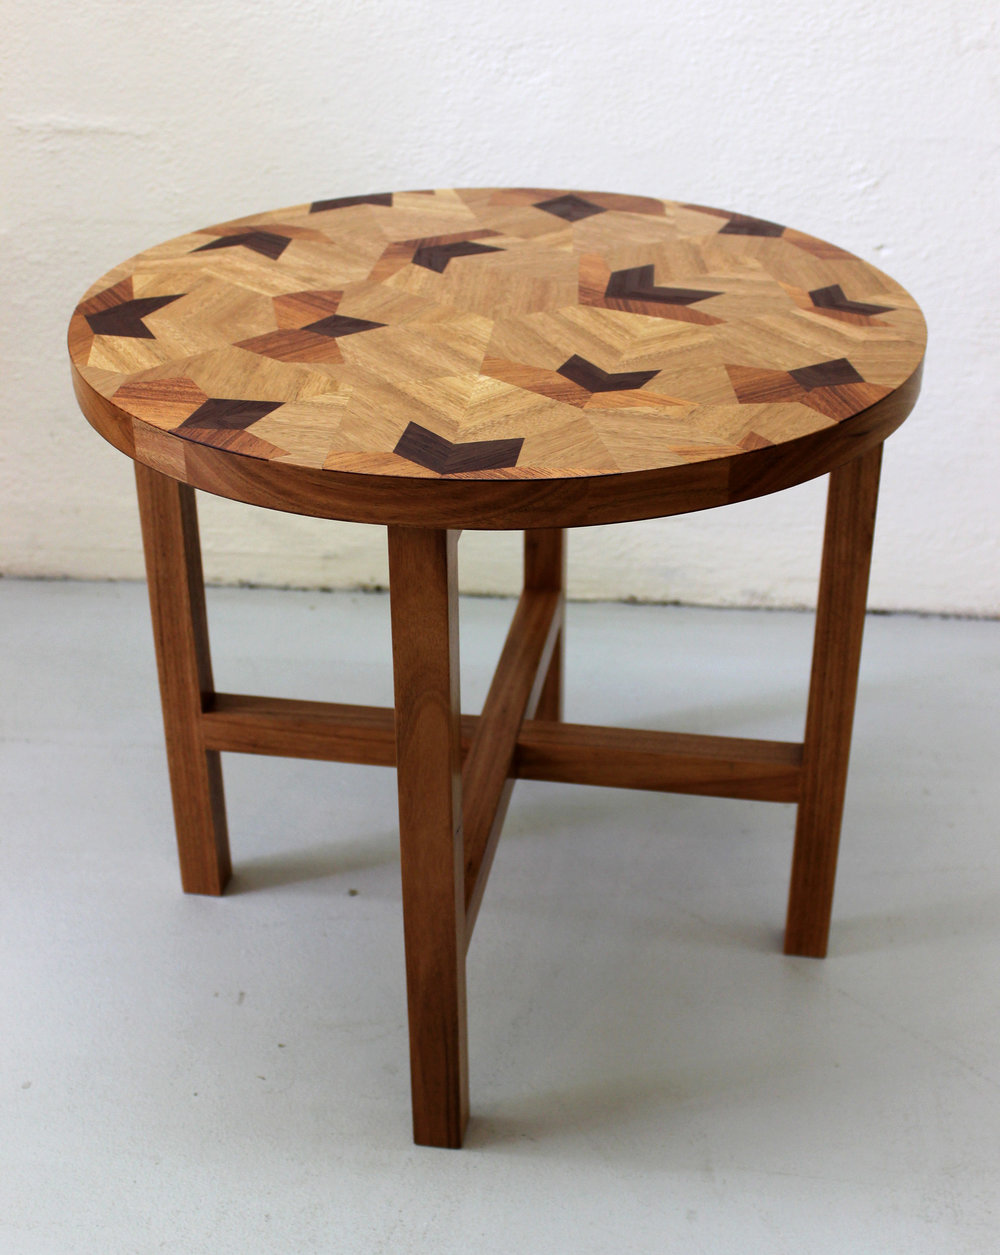 Callistemon Low Table 2.jpg